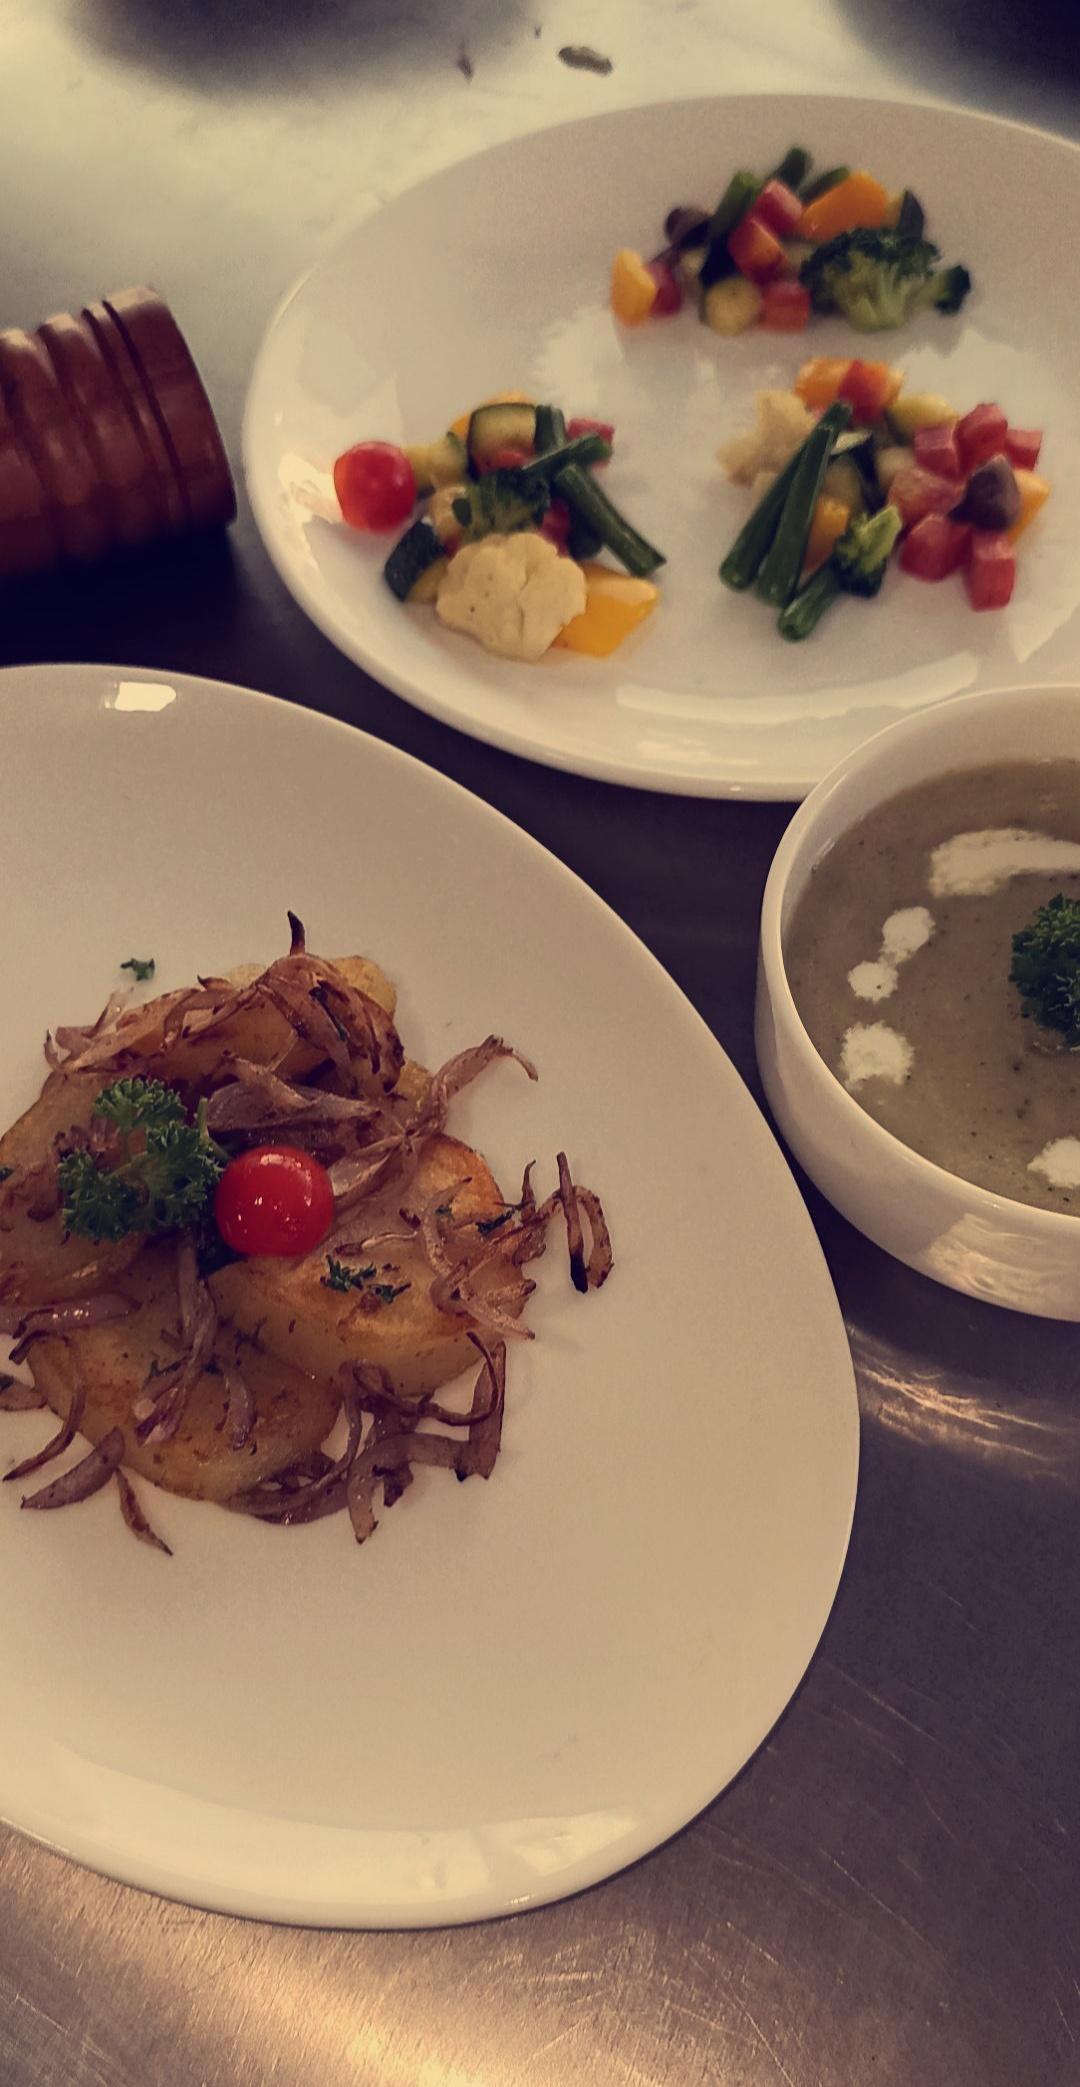 Potato wedges with potato leek soup